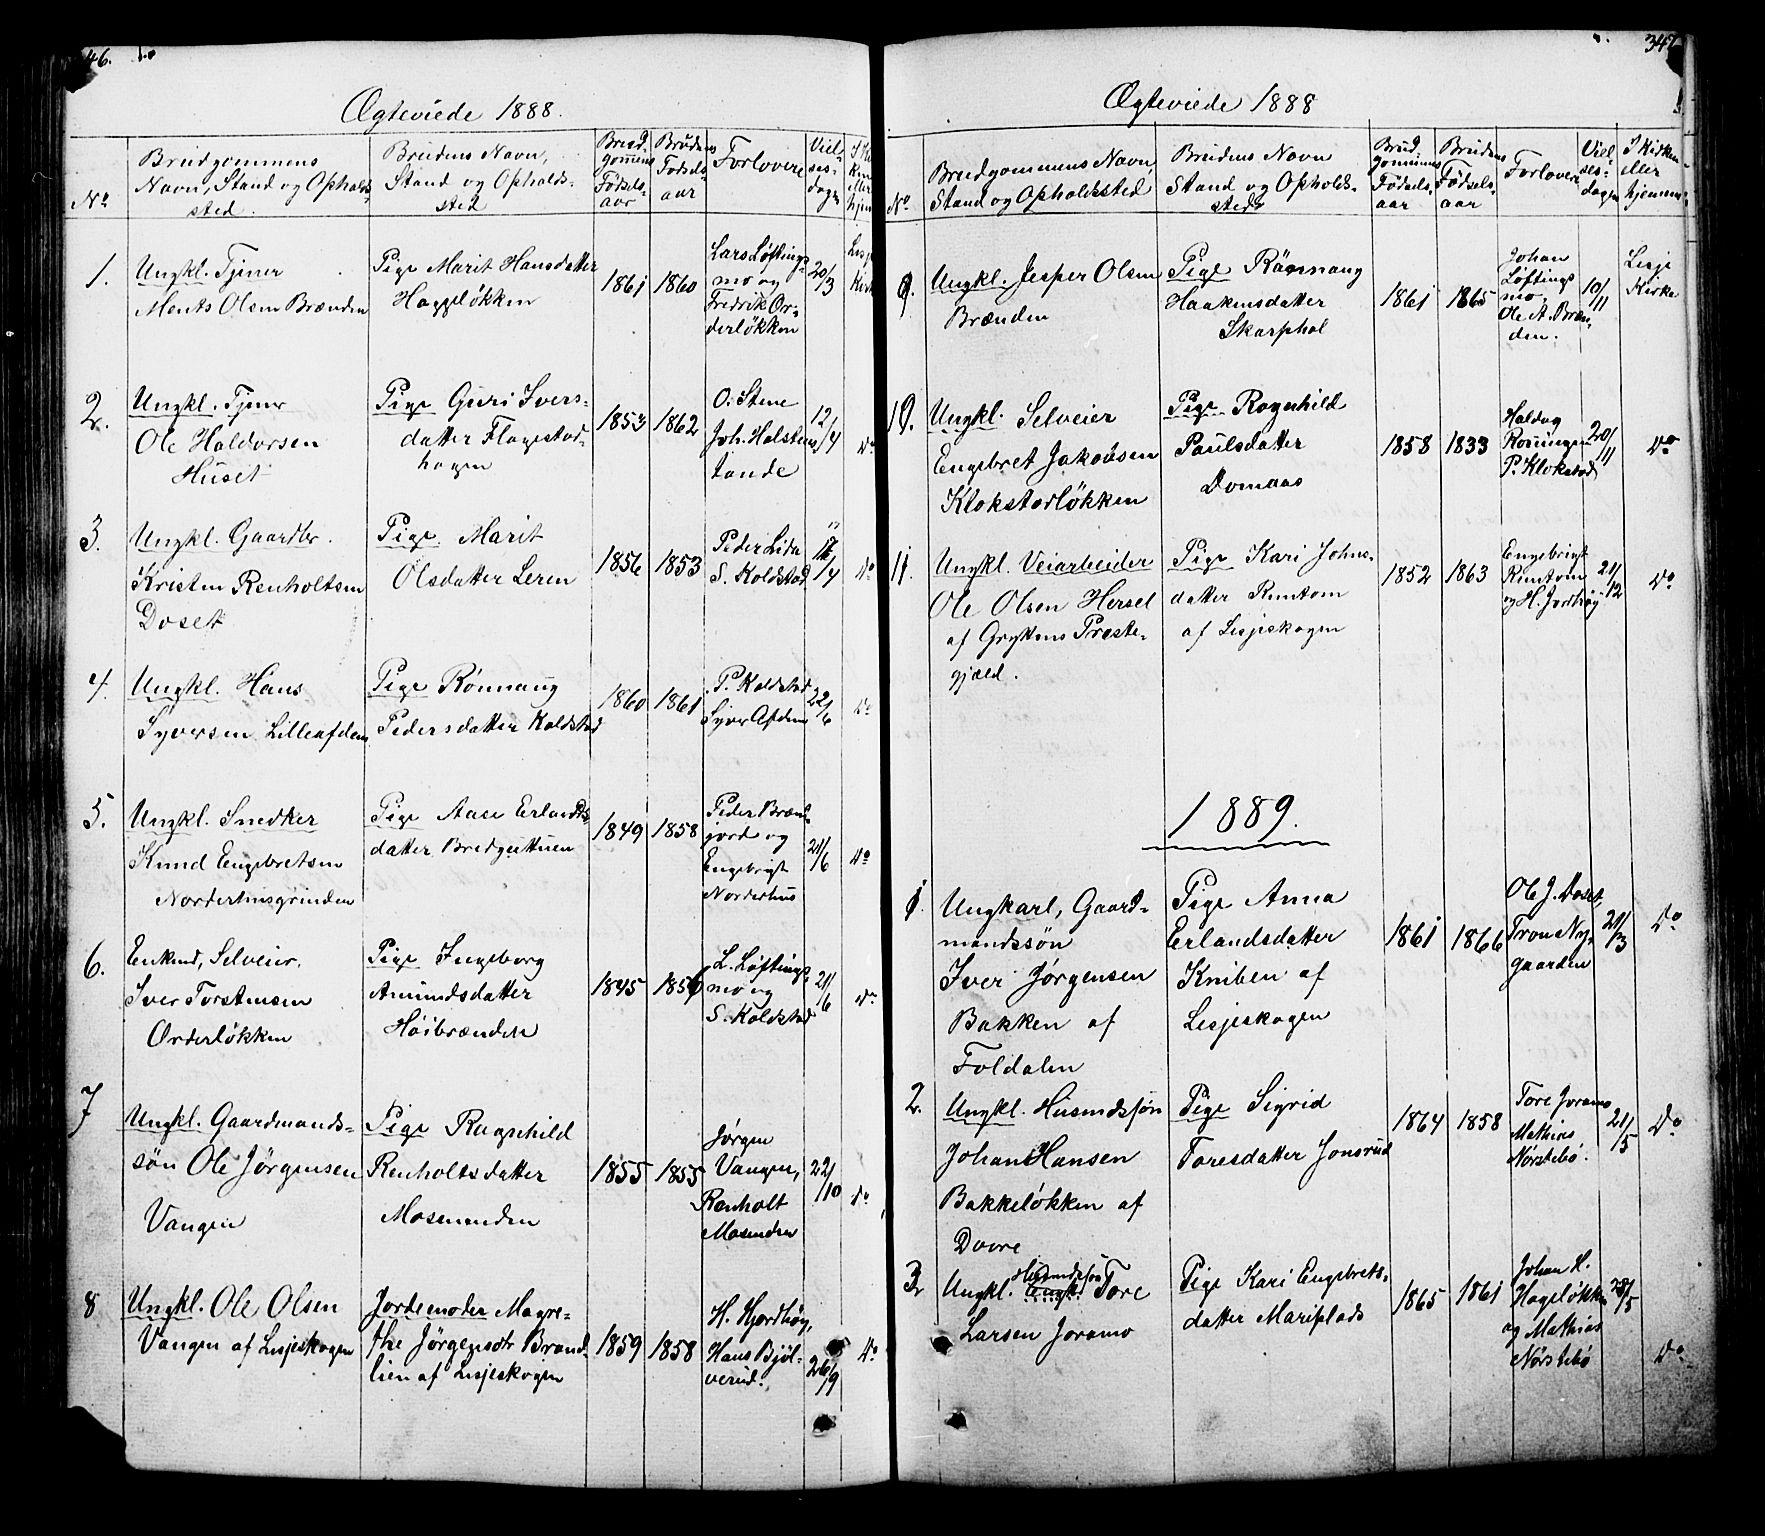 SAH, Lesja prestekontor, Klokkerbok nr. 5, 1850-1894, s. 346-347